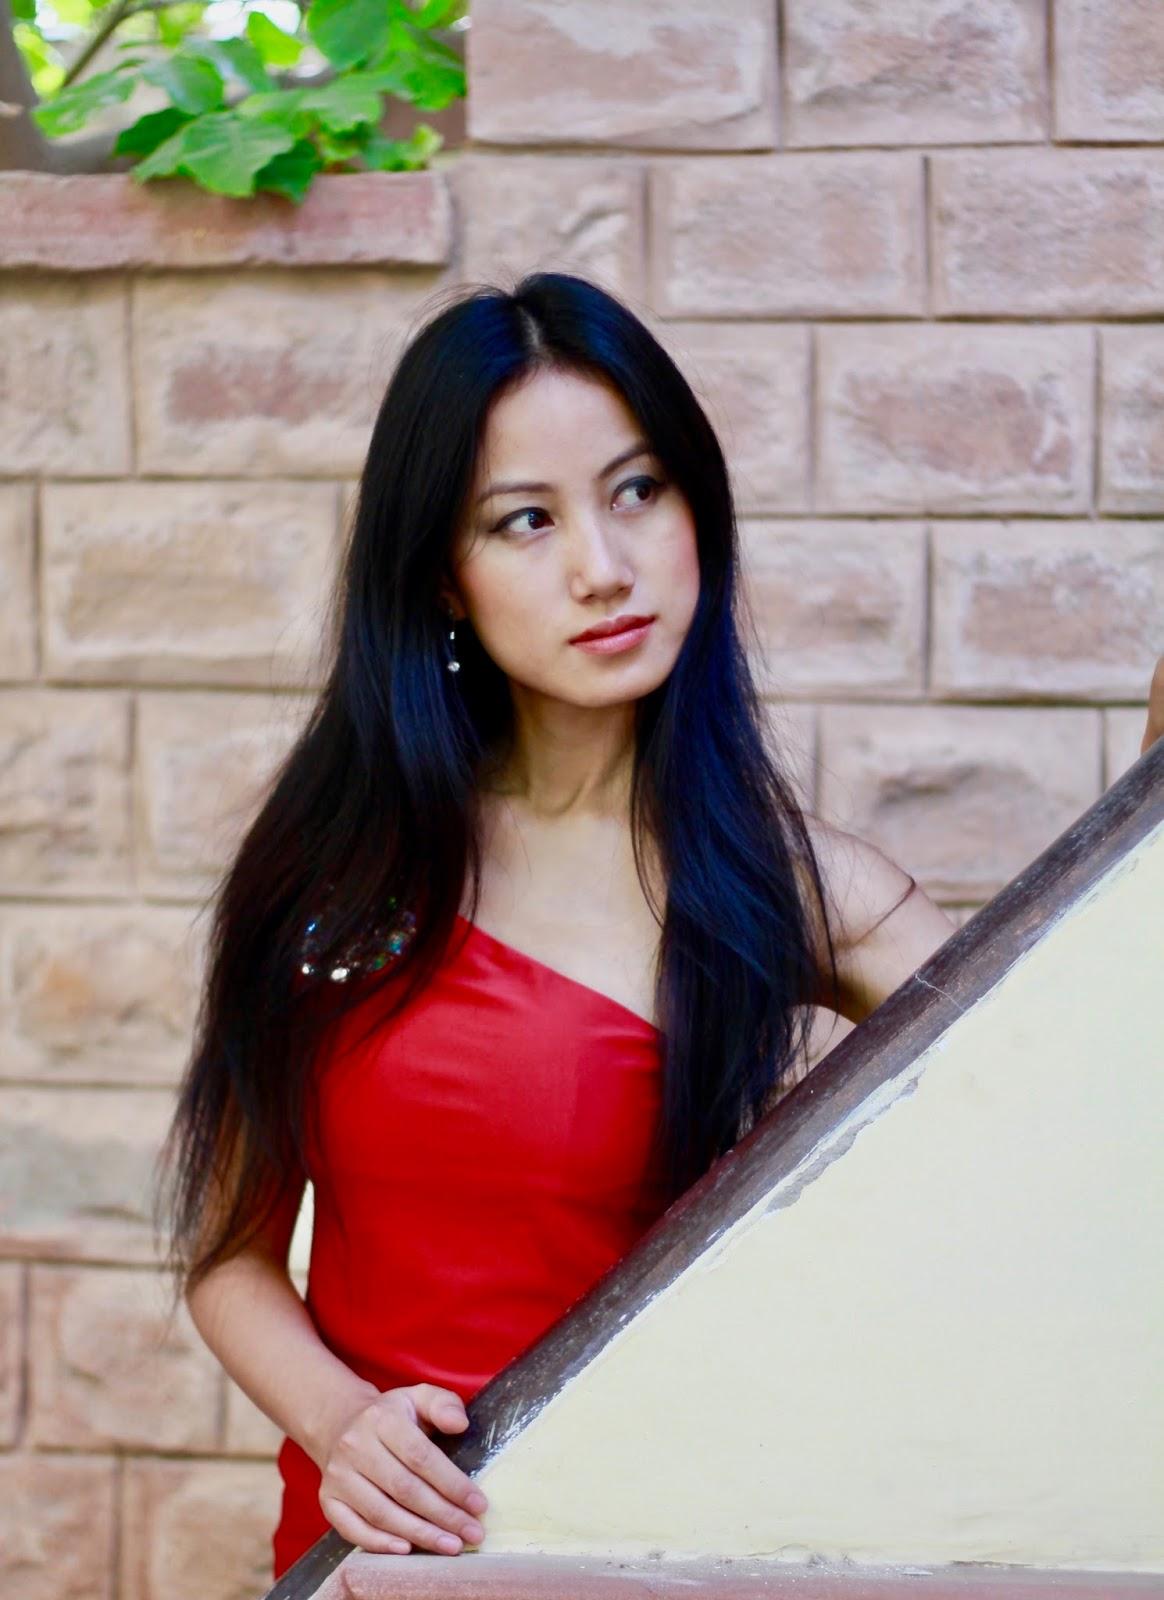 My first red dress - OnlyUrs fashion^^